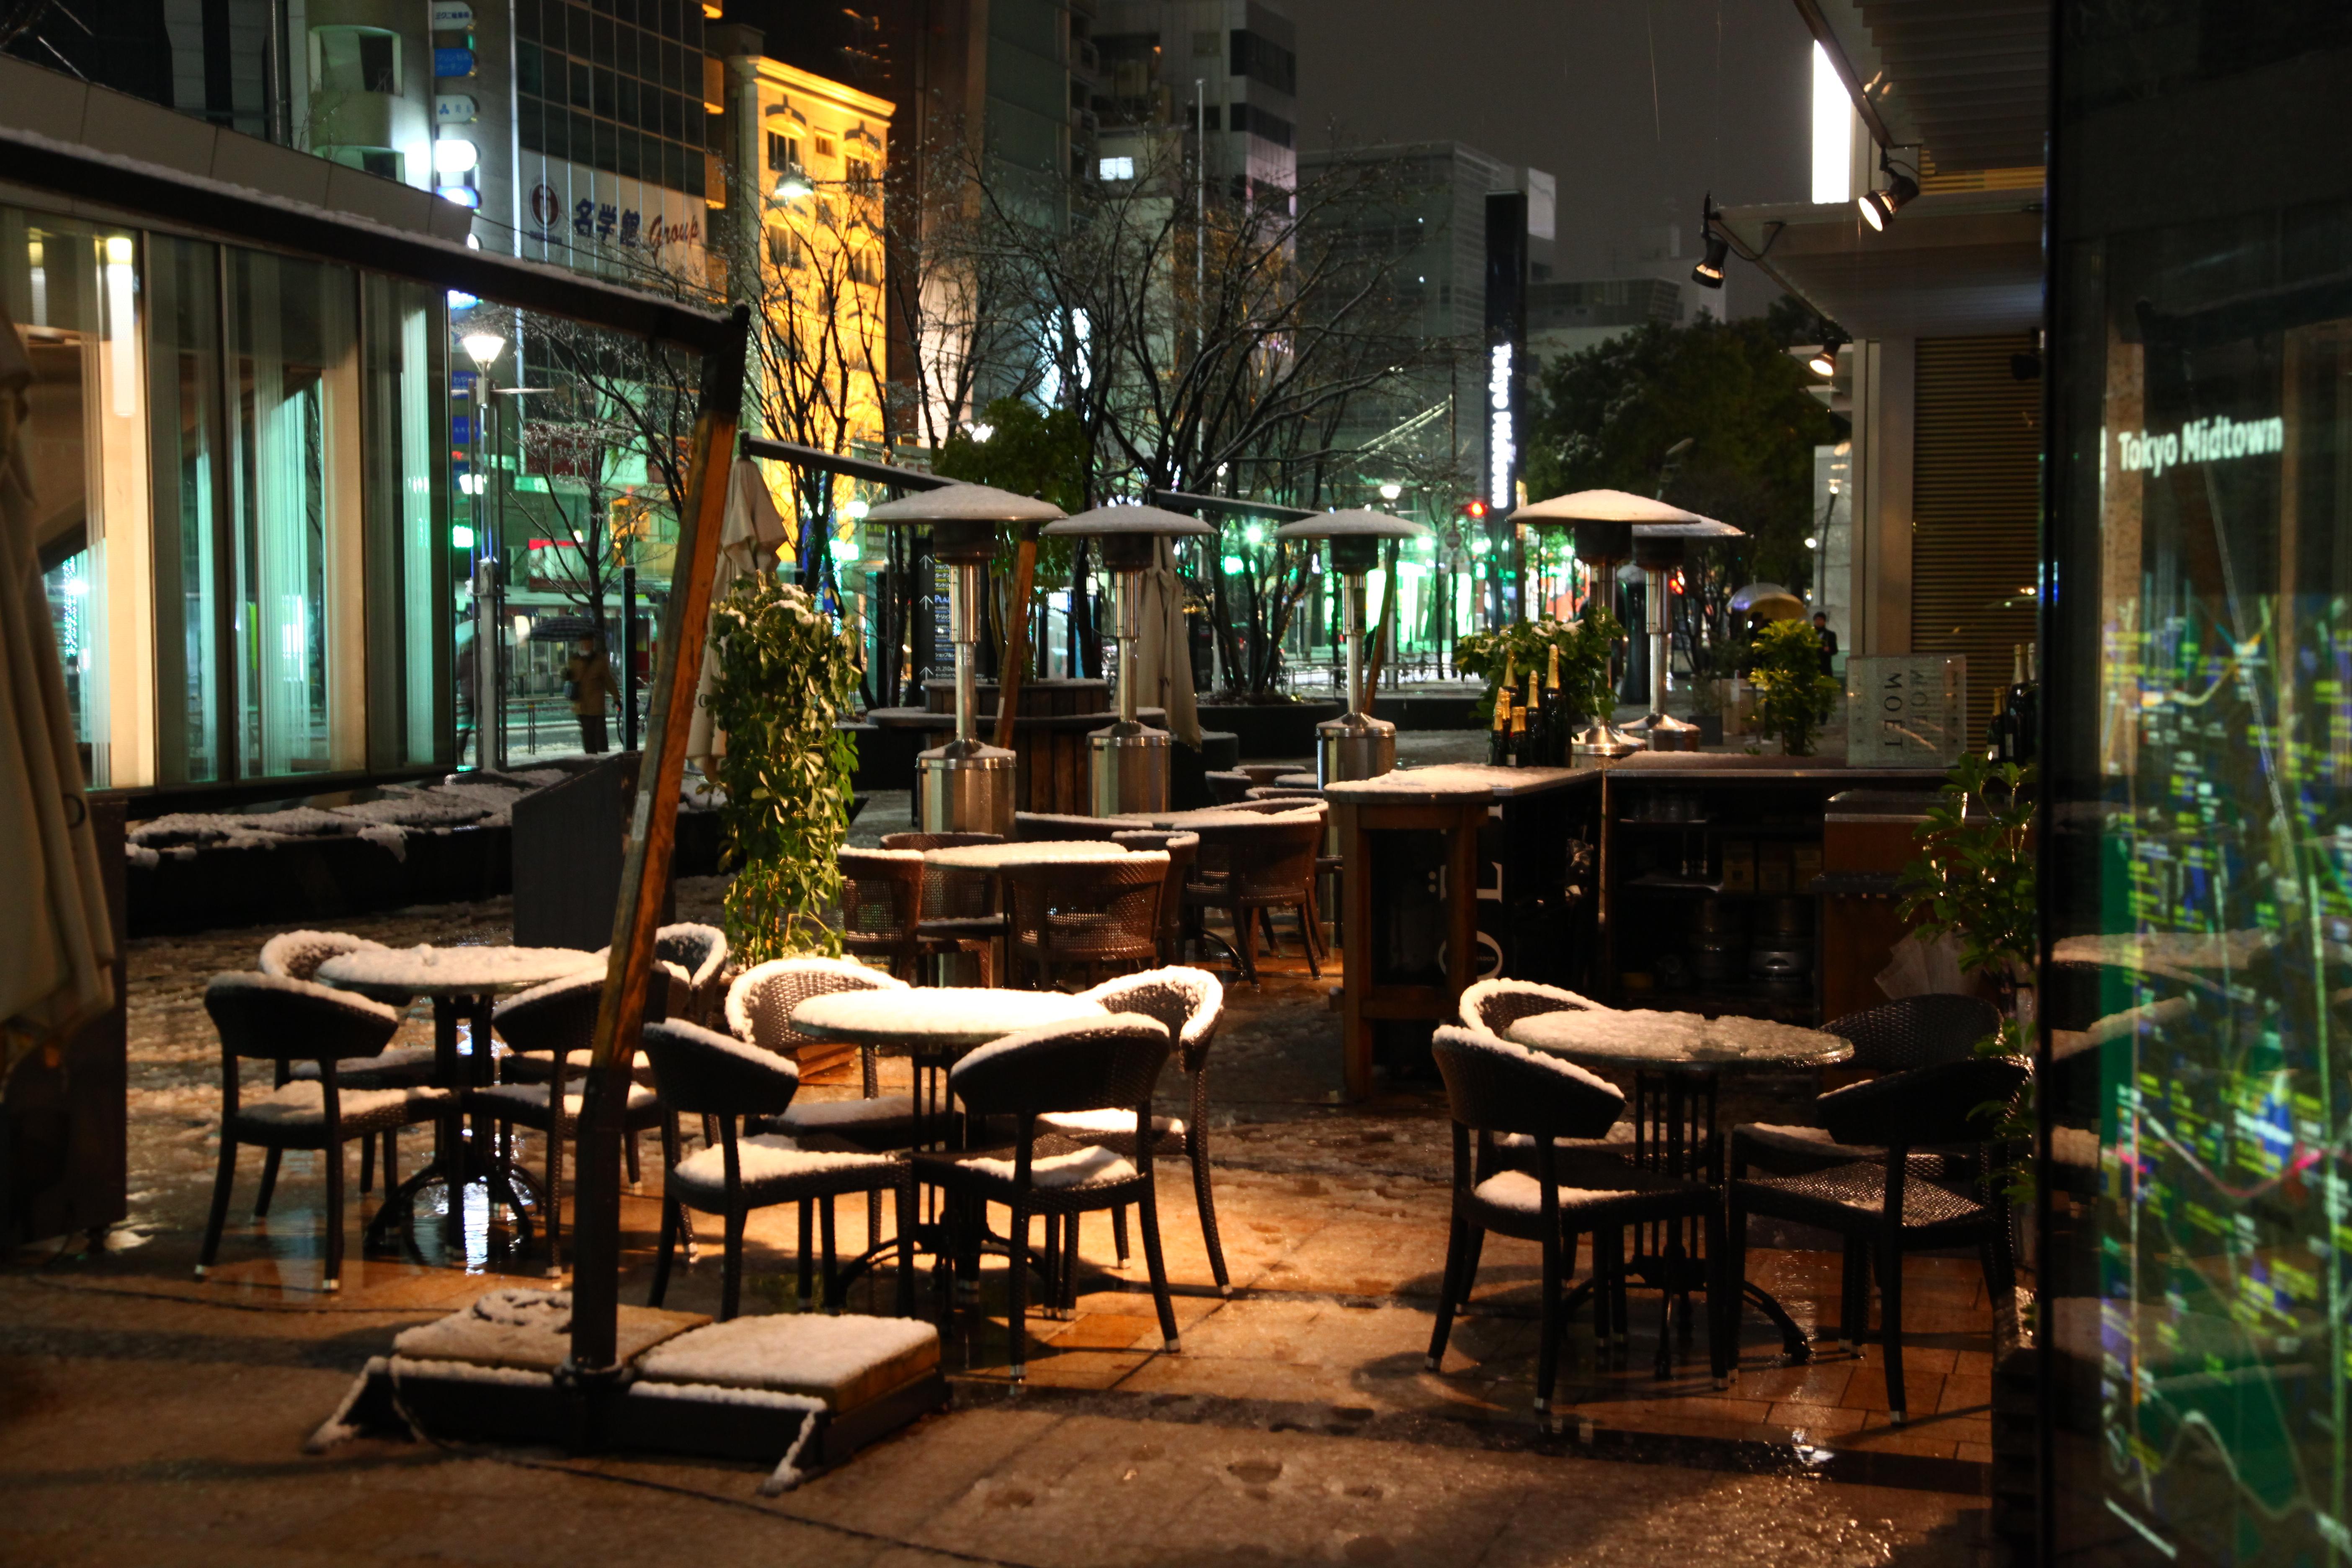 Outside Bar After The Snowstorm Shingopix